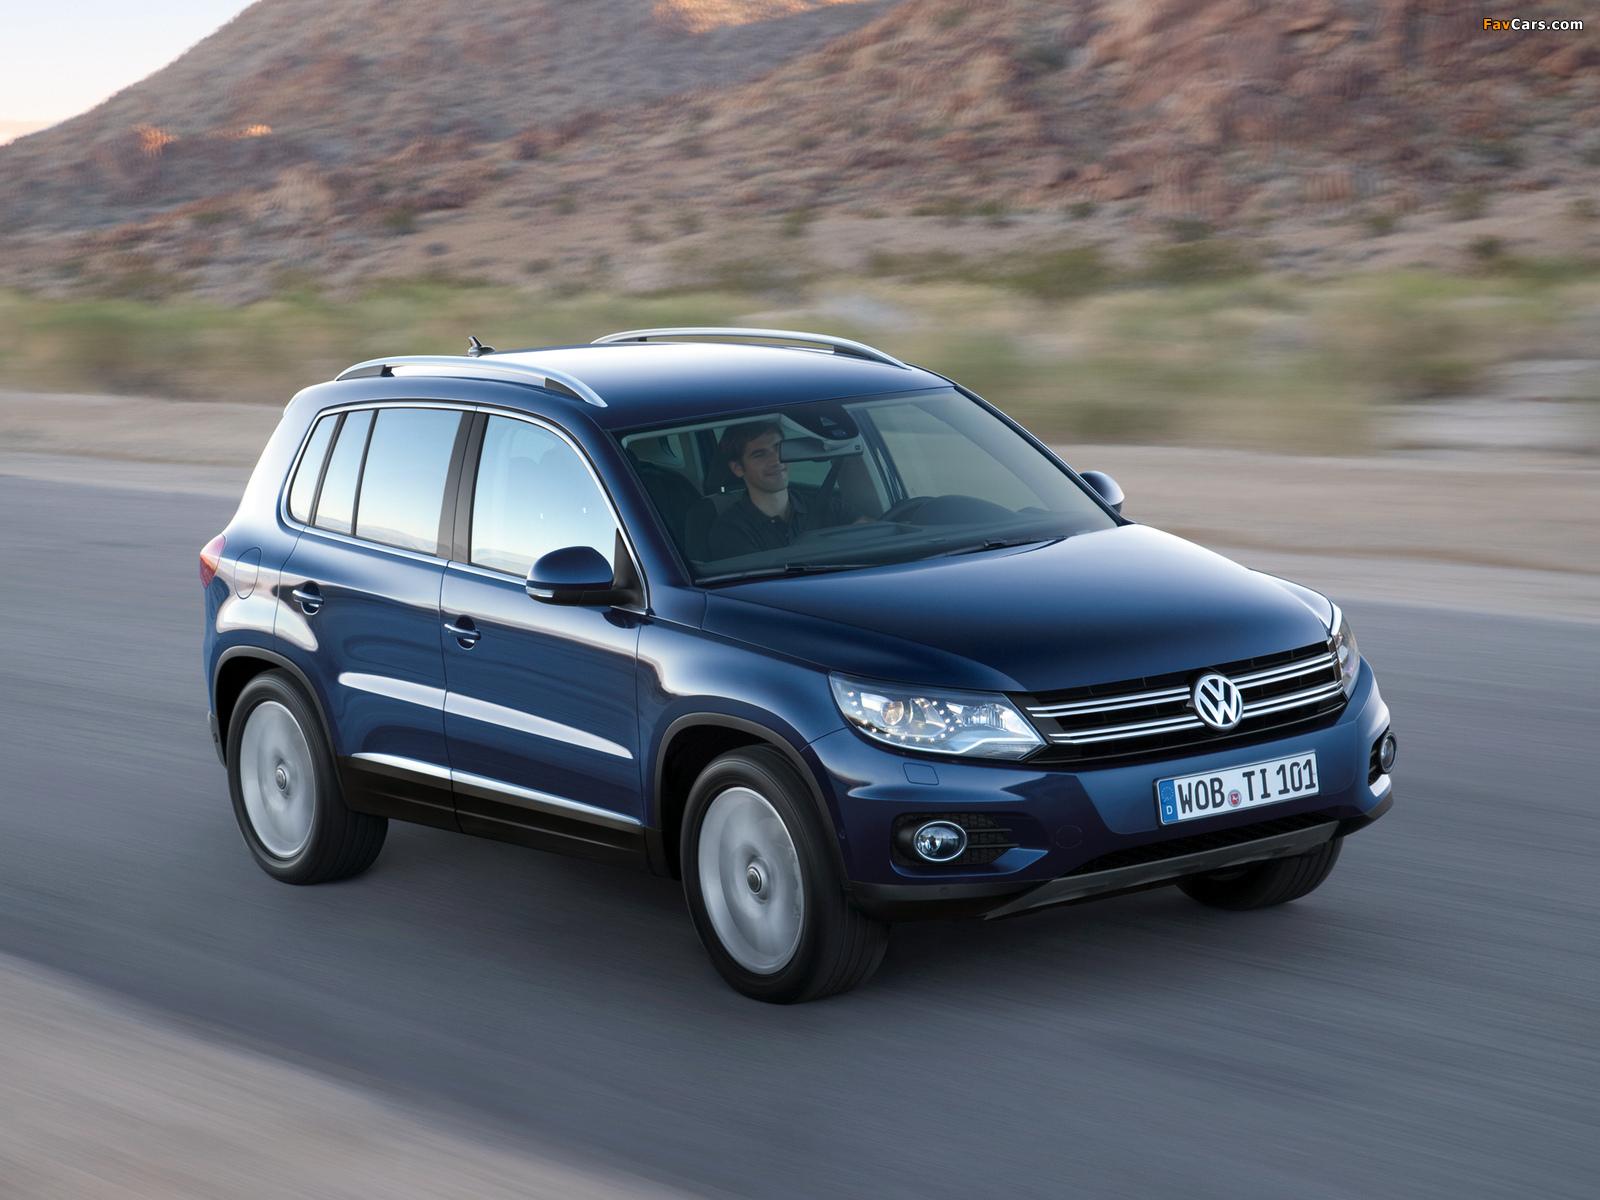 Volkswagen Tiguan Track & Style 2011 images (1600 x 1200)